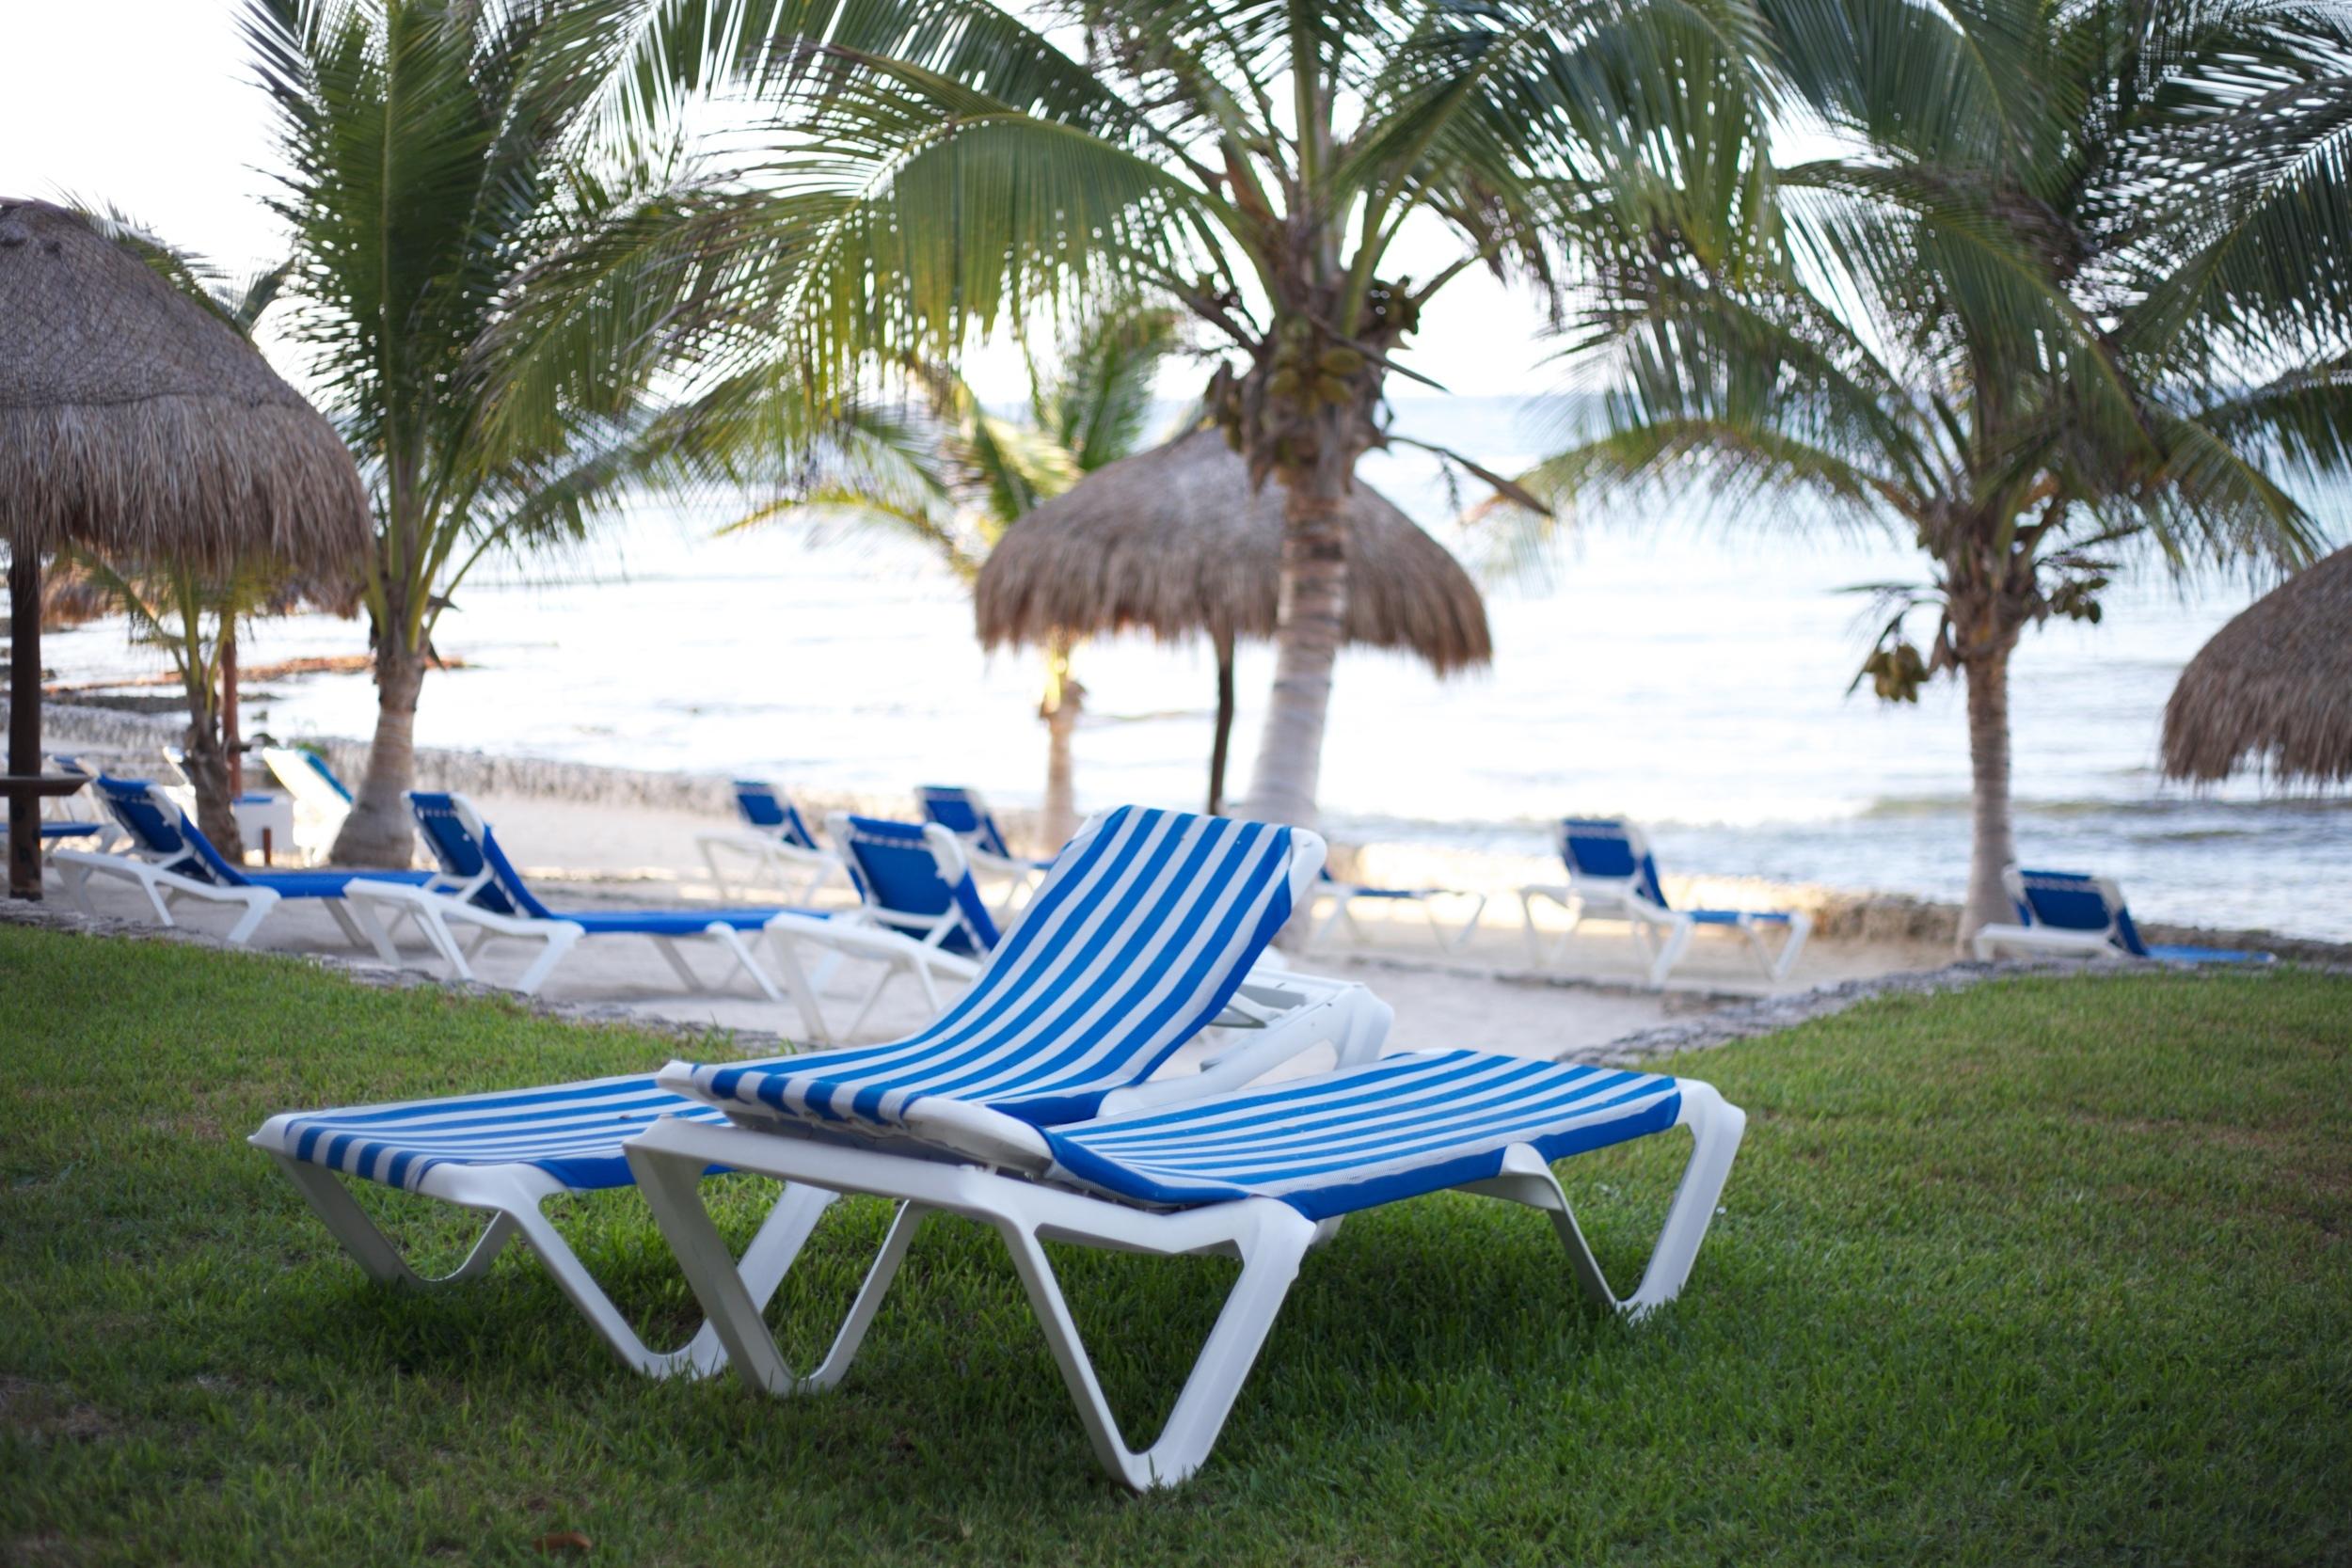 Striped blue and white beach chairs in Akumal, Mexico.